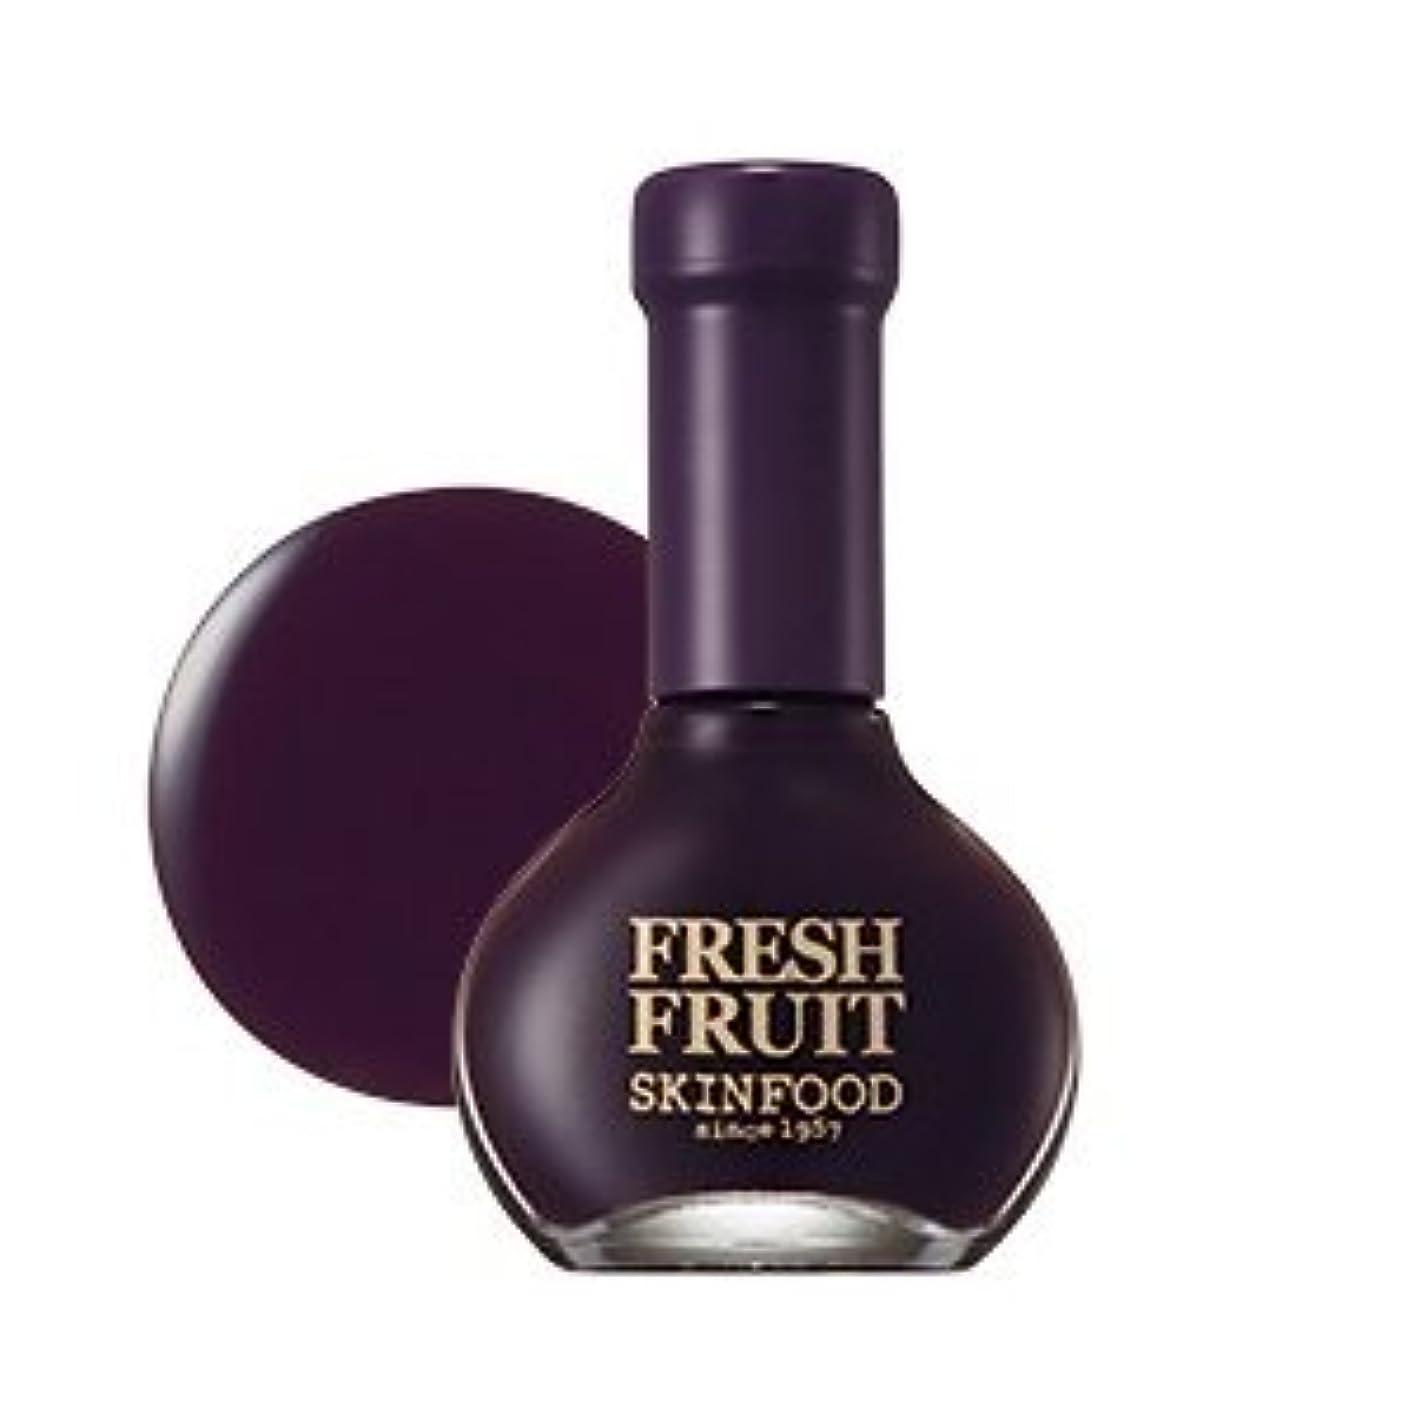 SKINFOOD Fresh Fruit Nail (Plum Collection) (No.12 Plum Oil) / スキンフード 果物ネイル(プラムメロー) [並行輸入品]